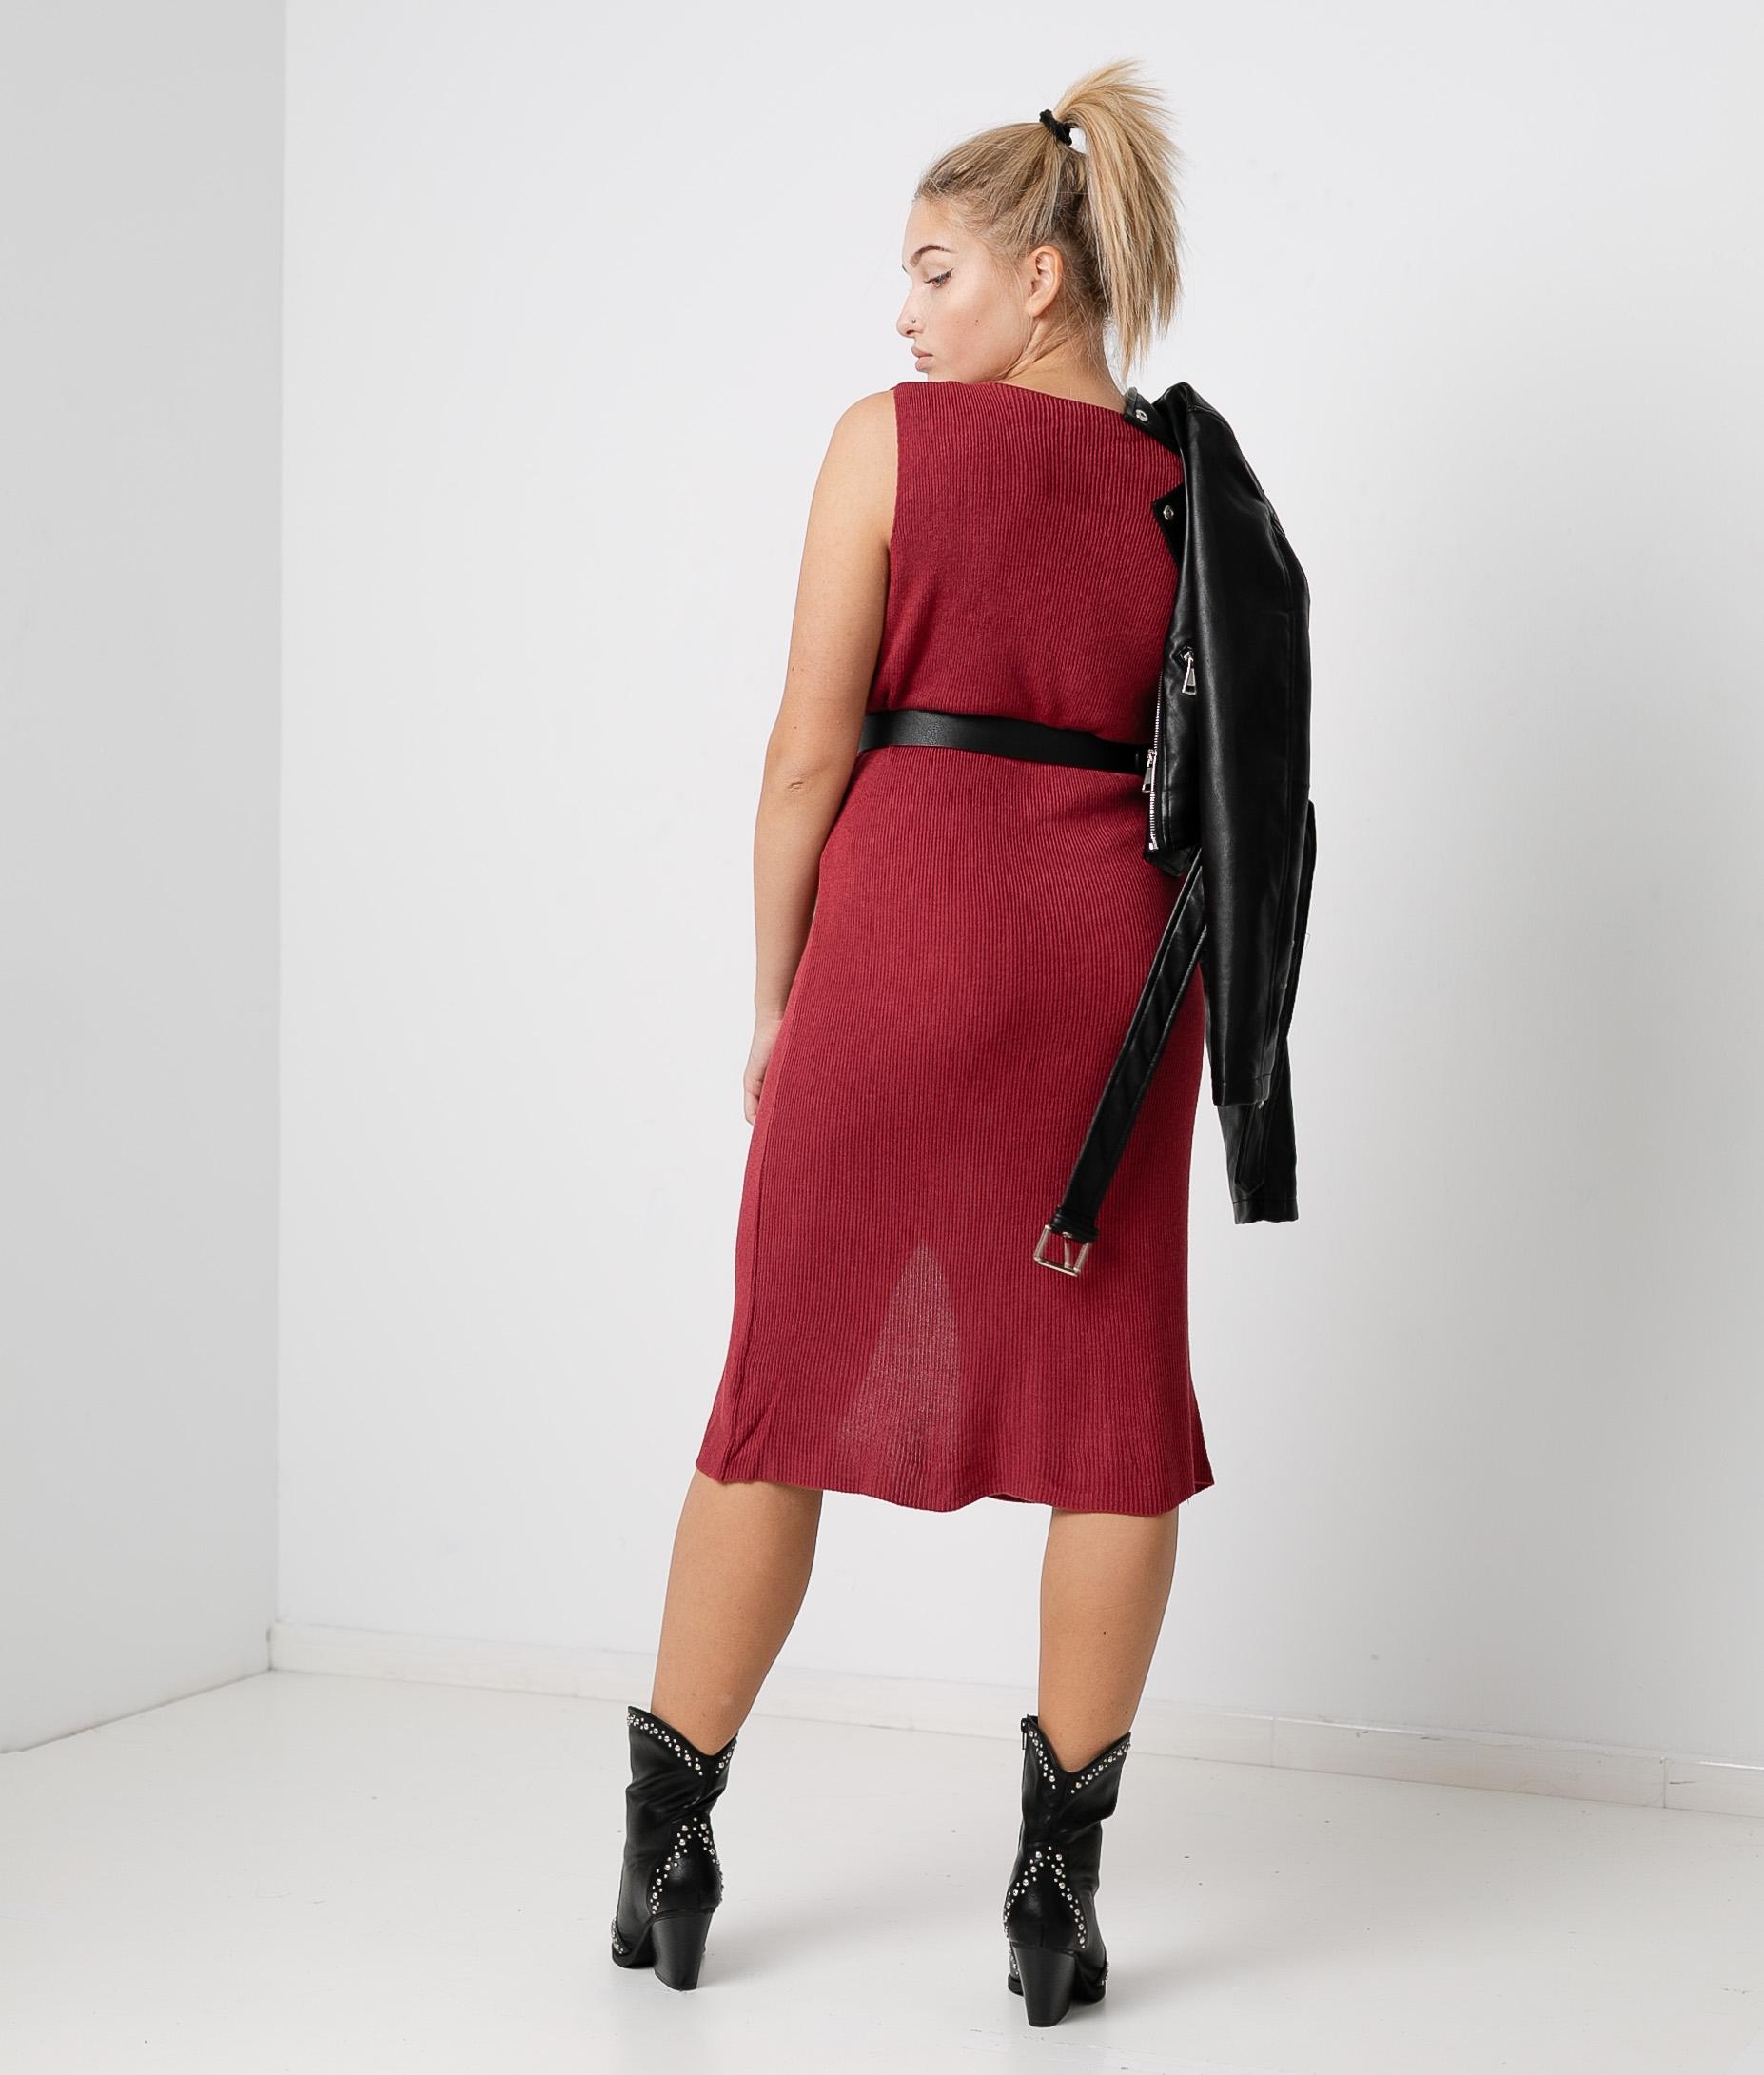 Porfido Dress - Maroon